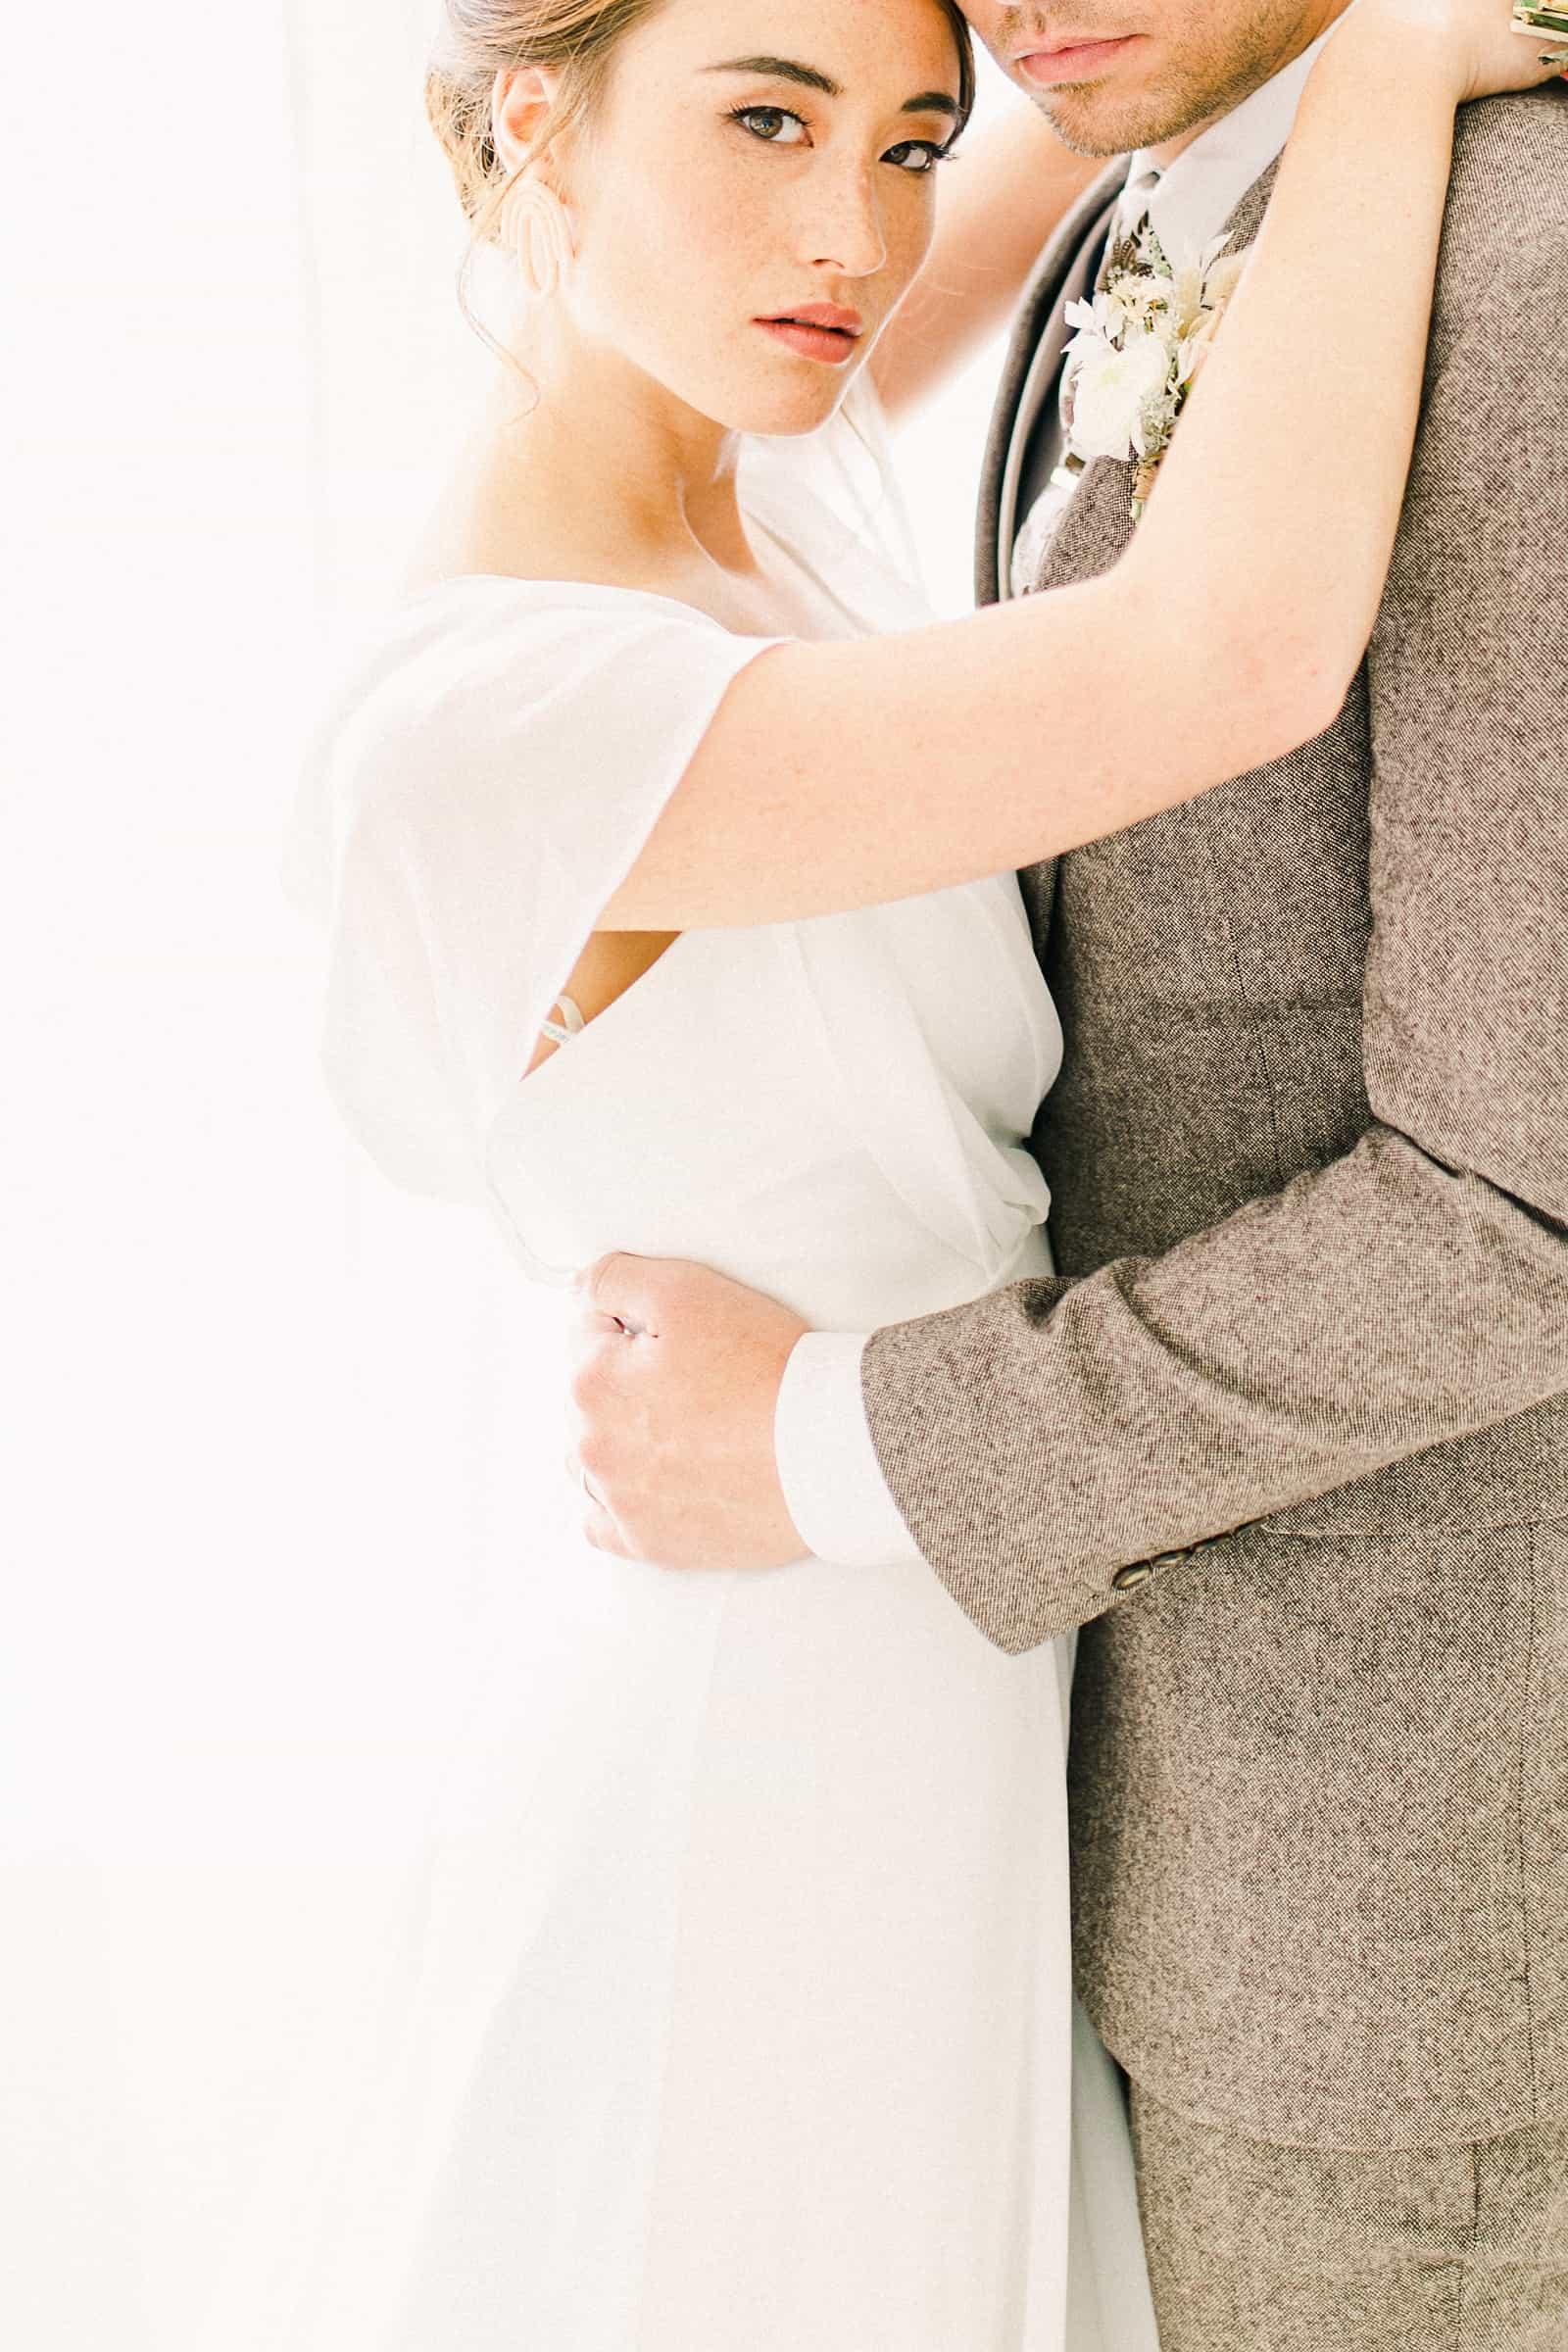 Modern bride and groom, minimalist wedding